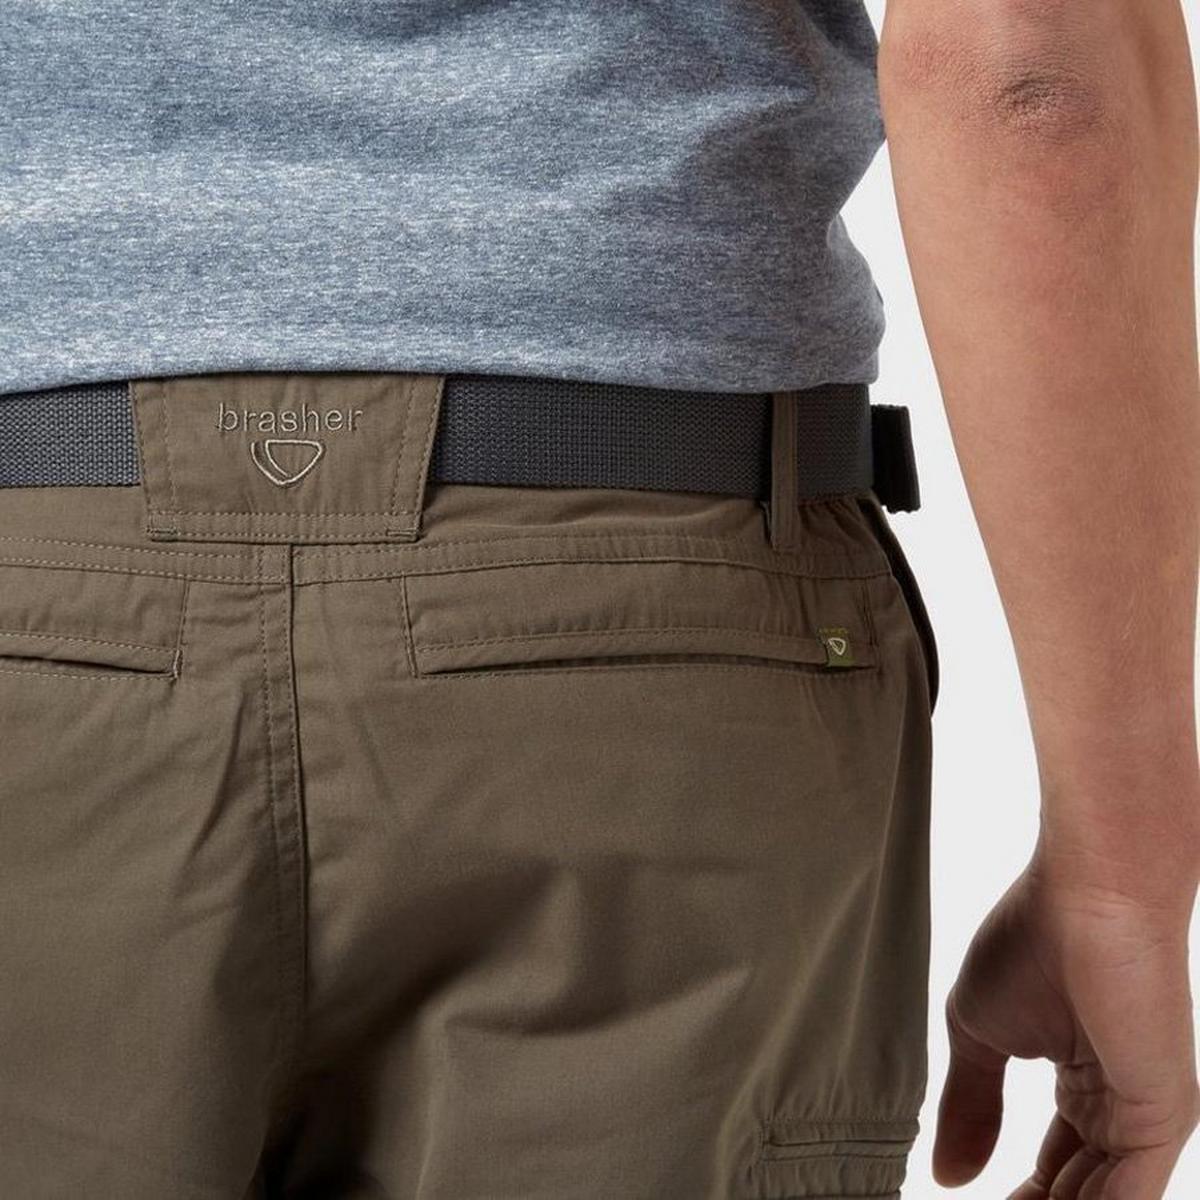 Brasher Men's Walking Trouser (Long) - Brown